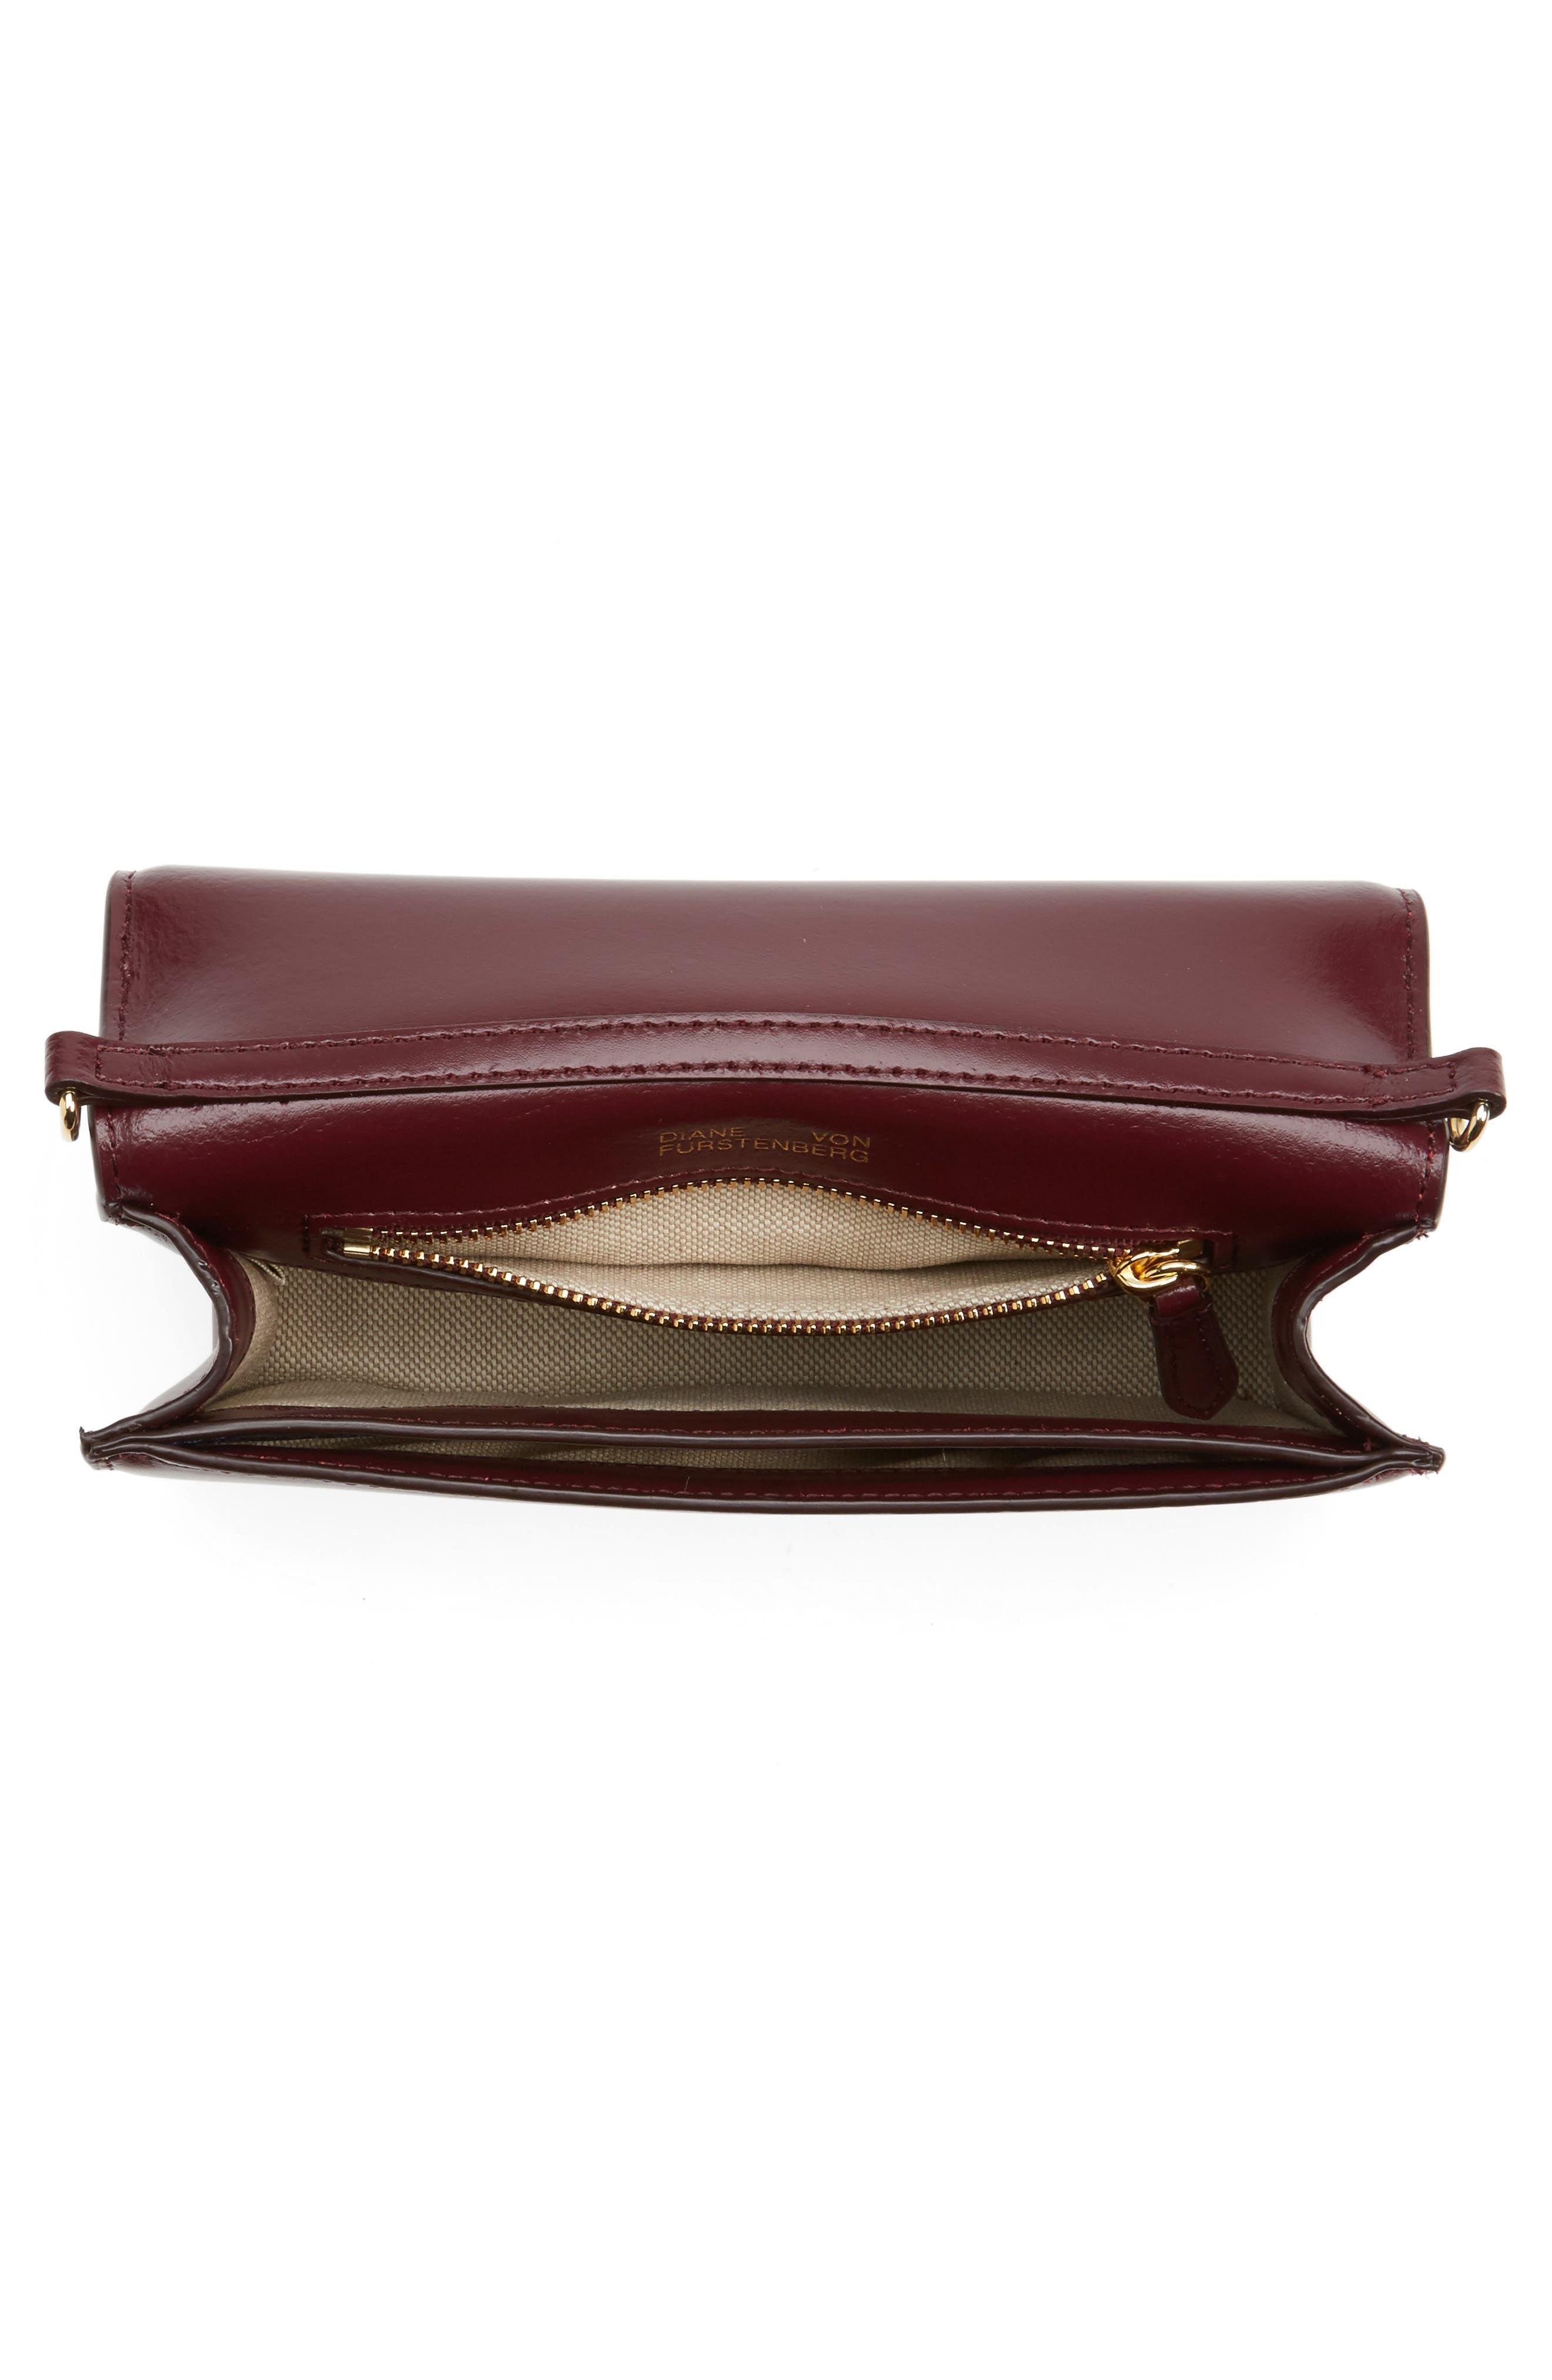 Soirée Leather Convertible Crossbody Bag,                             Alternate thumbnail 15, color,